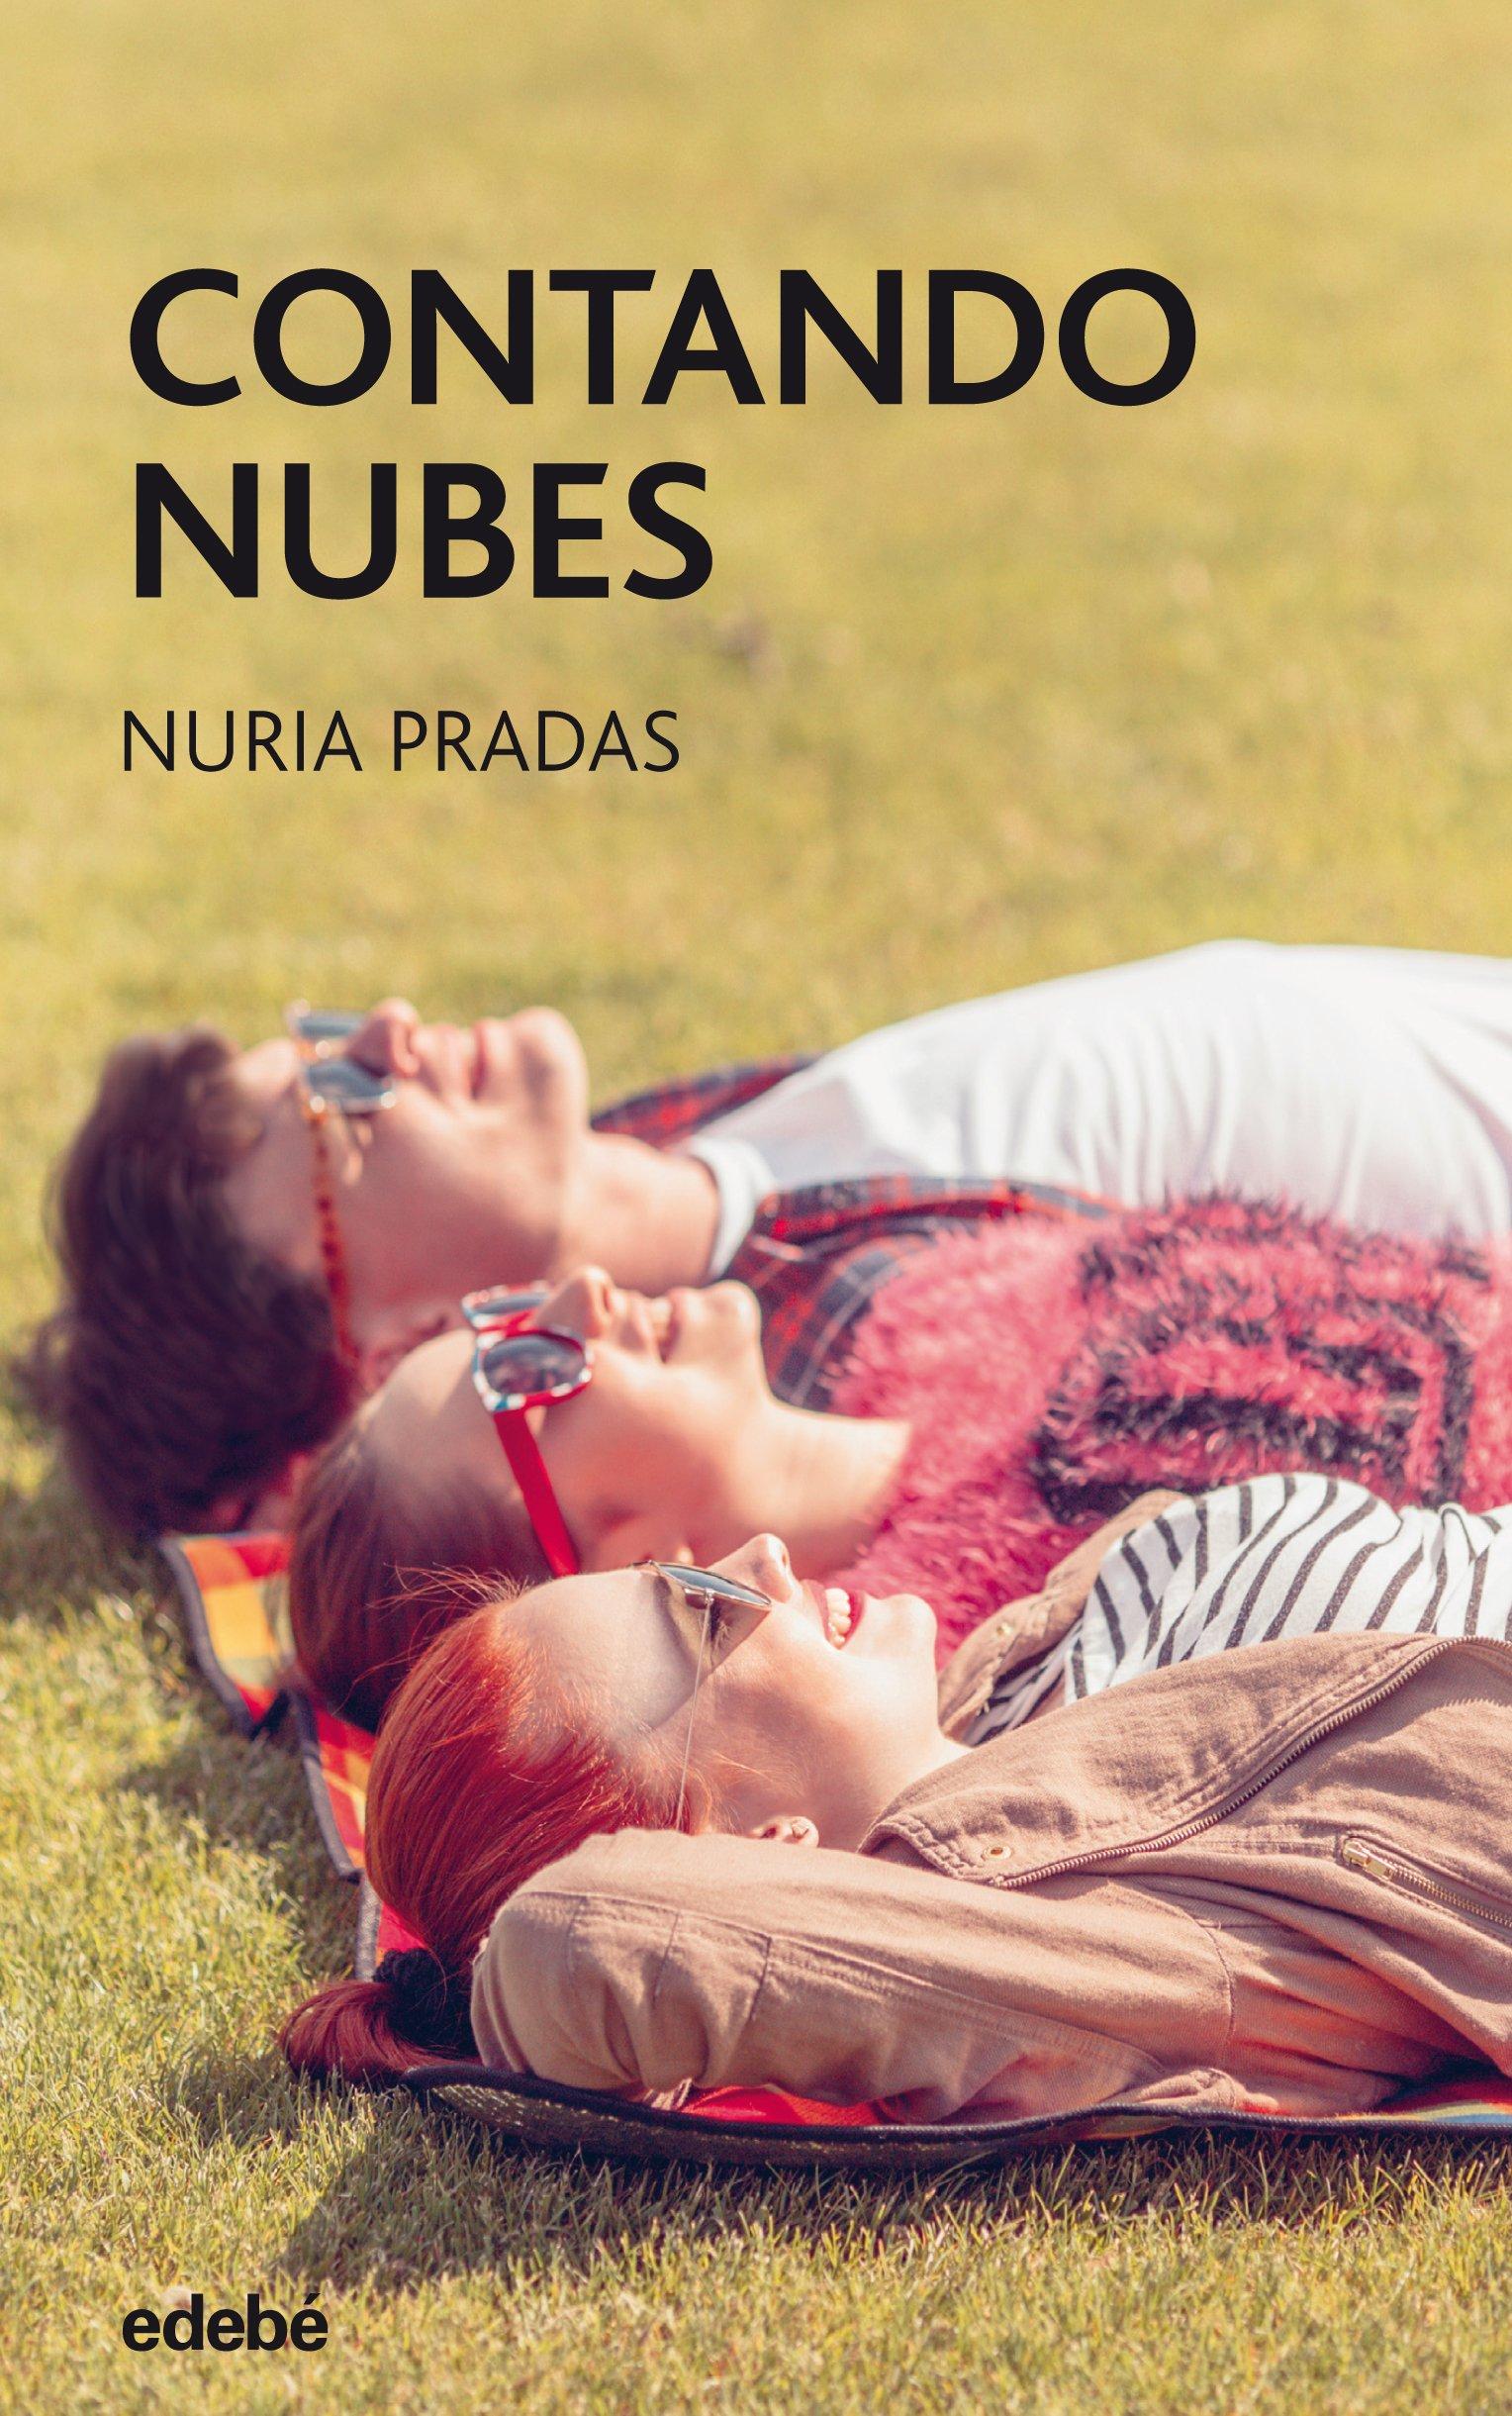 Resultado de imagen de Contando nubes, Nuria Pradas Andreu